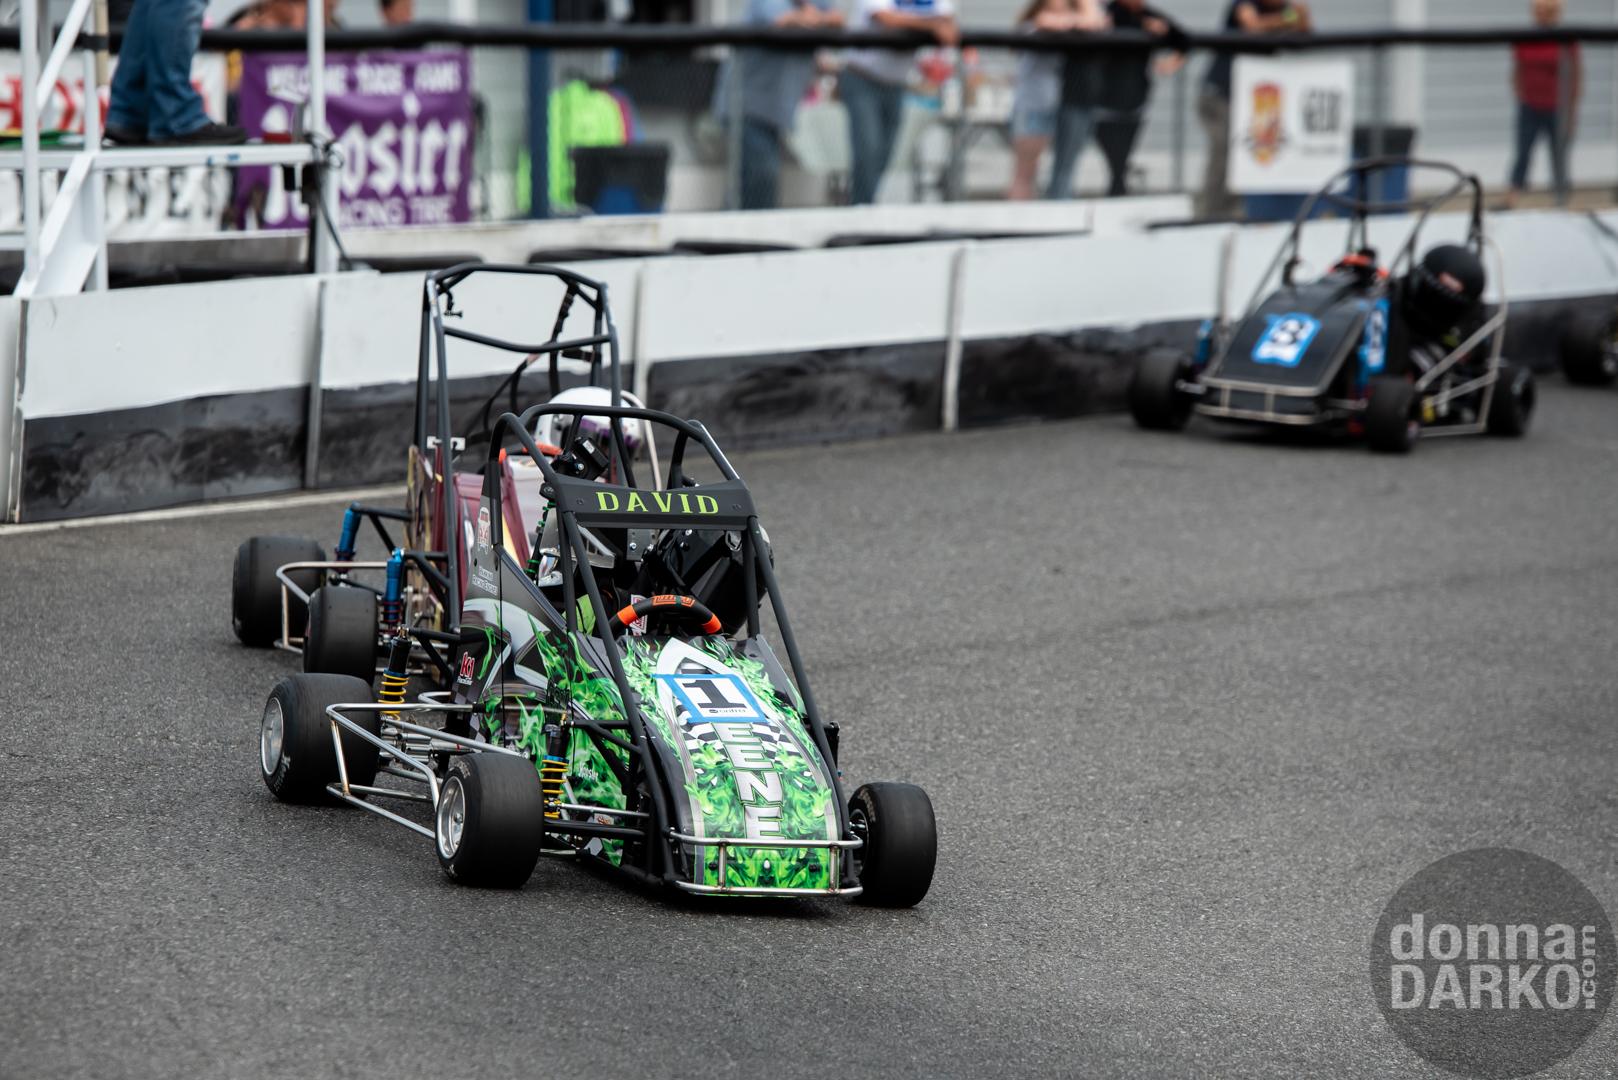 QWMA (Racing) 8-11-2019 DSC_7555.jpg